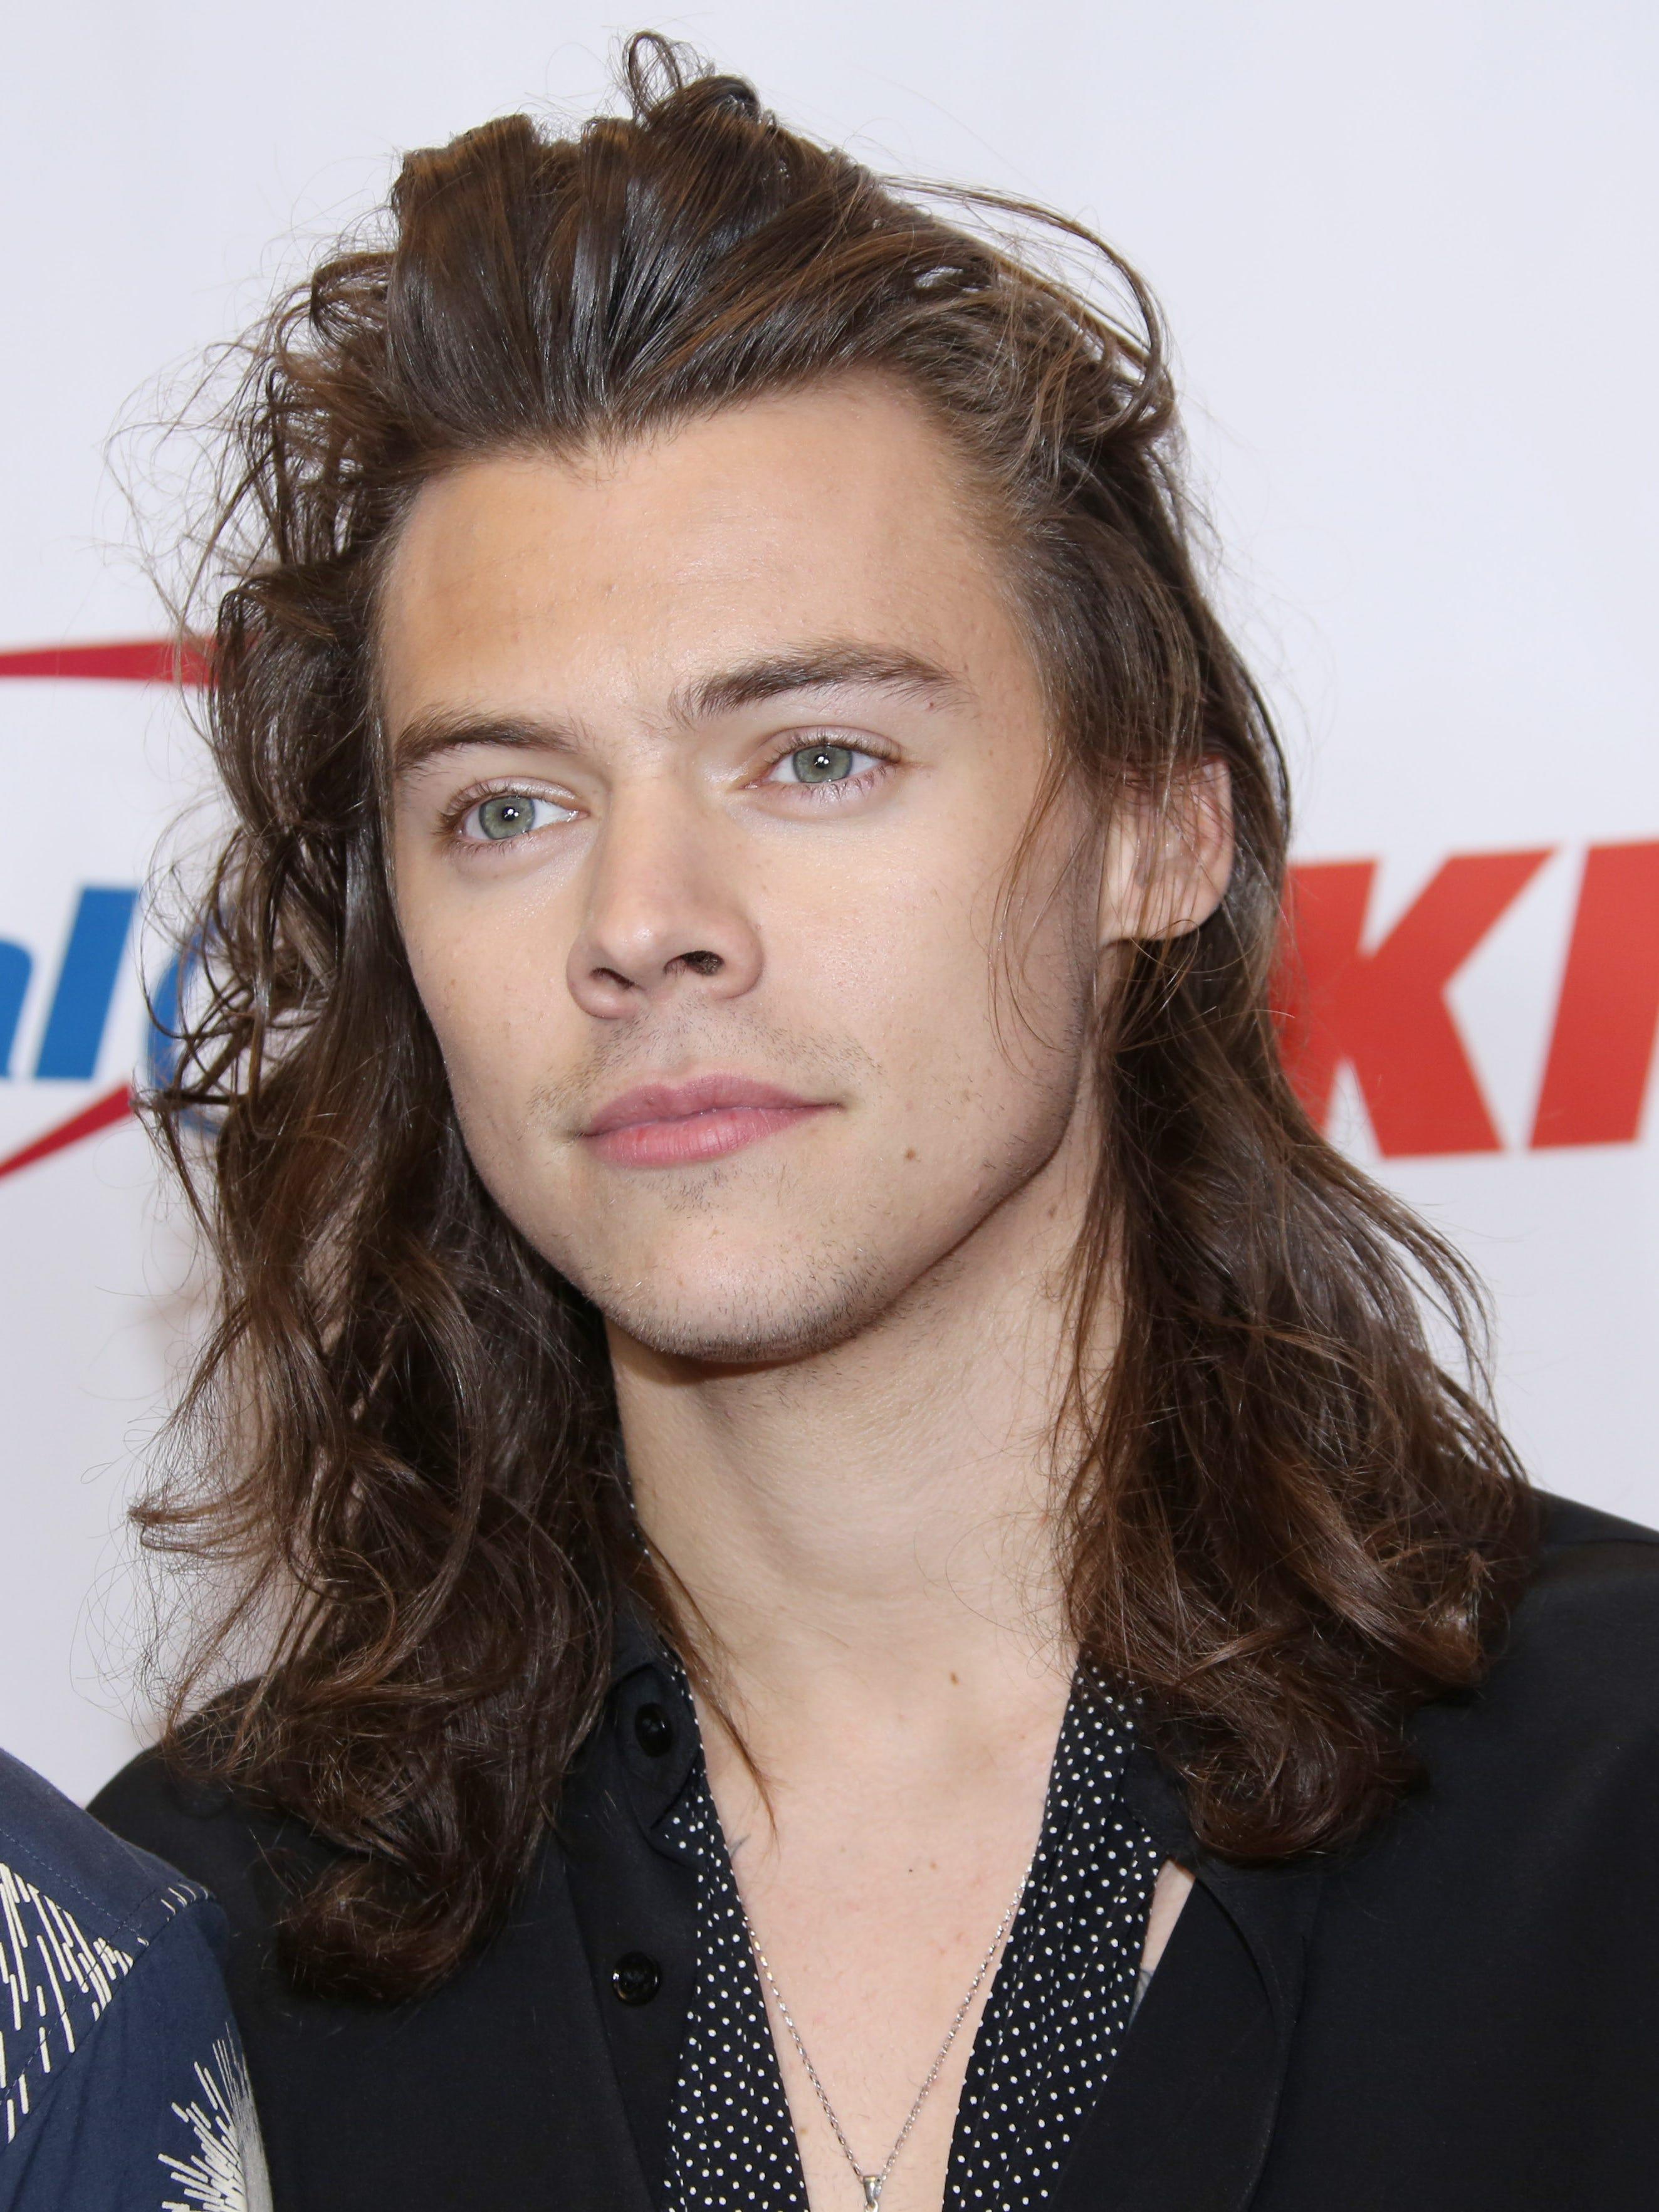 Harry Styles Dunkirk Short Haircut